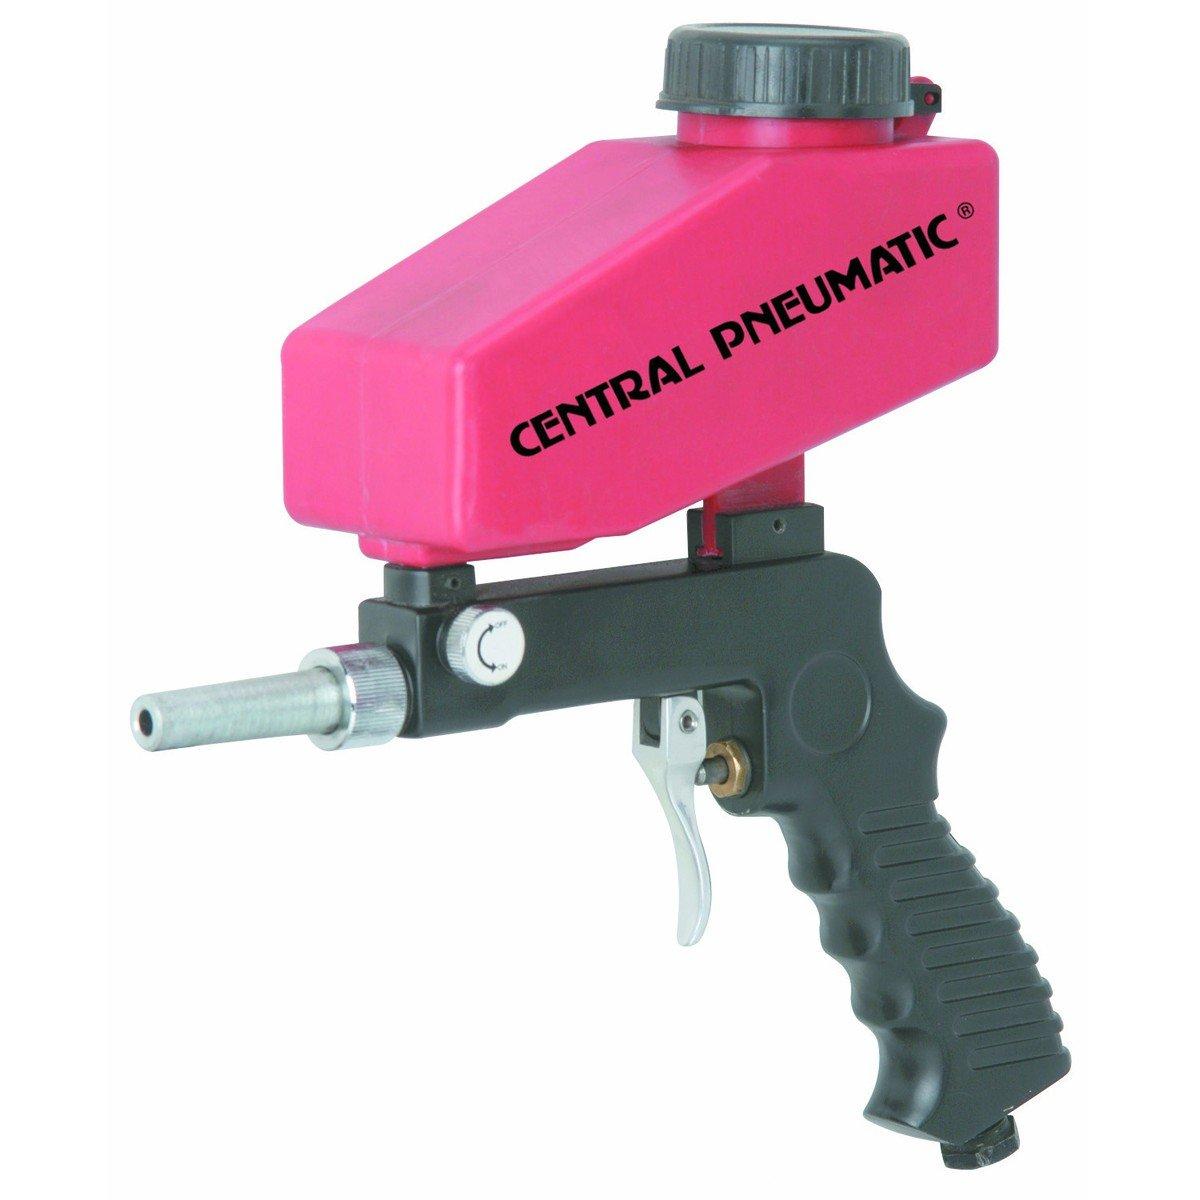 20 Oz. Hopper Gravity Feed Spot Blaster Gun